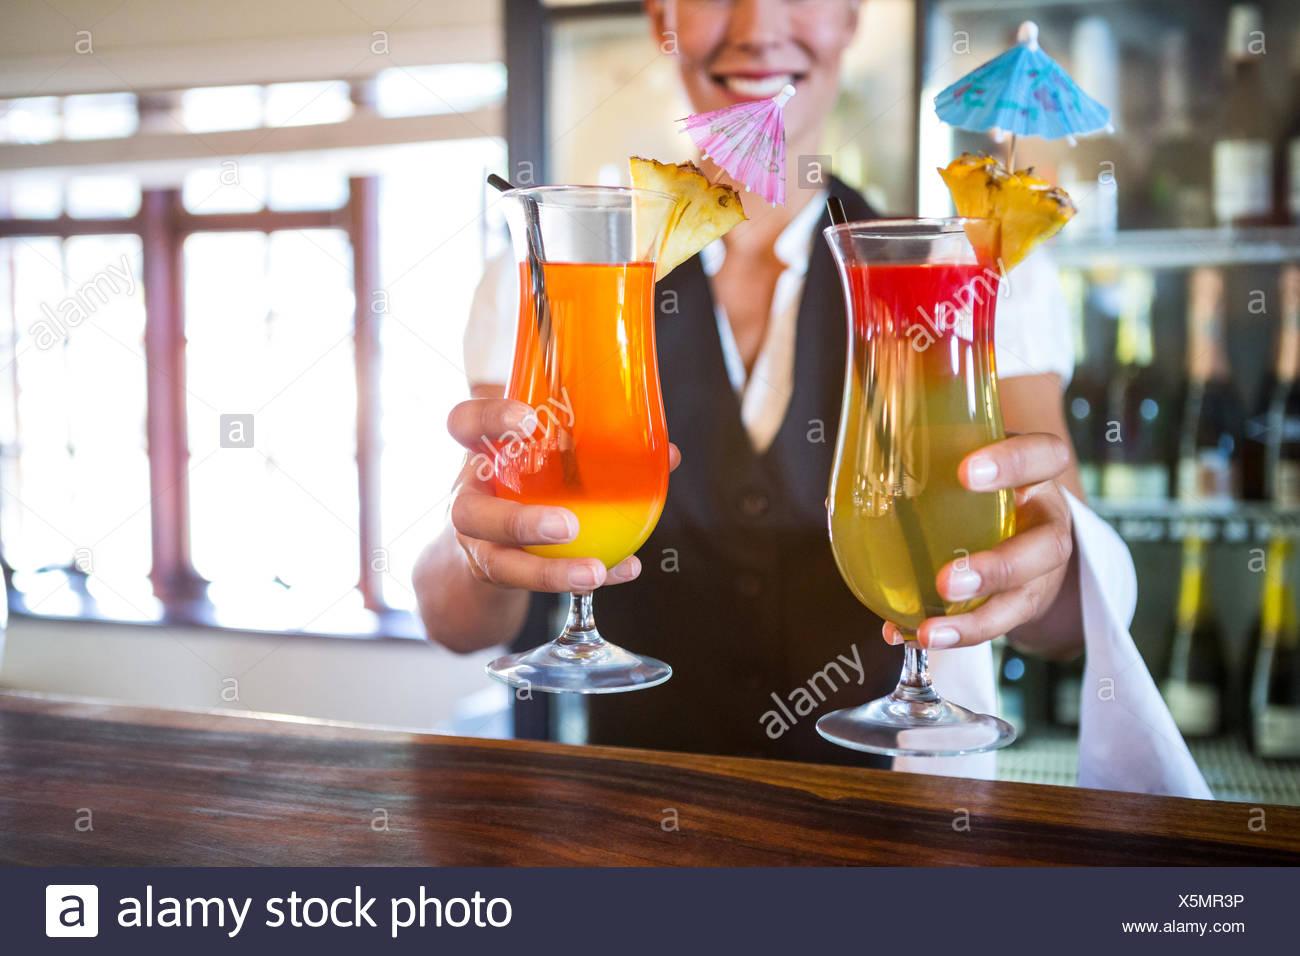 Waitress handing over cocktails - Stock Image